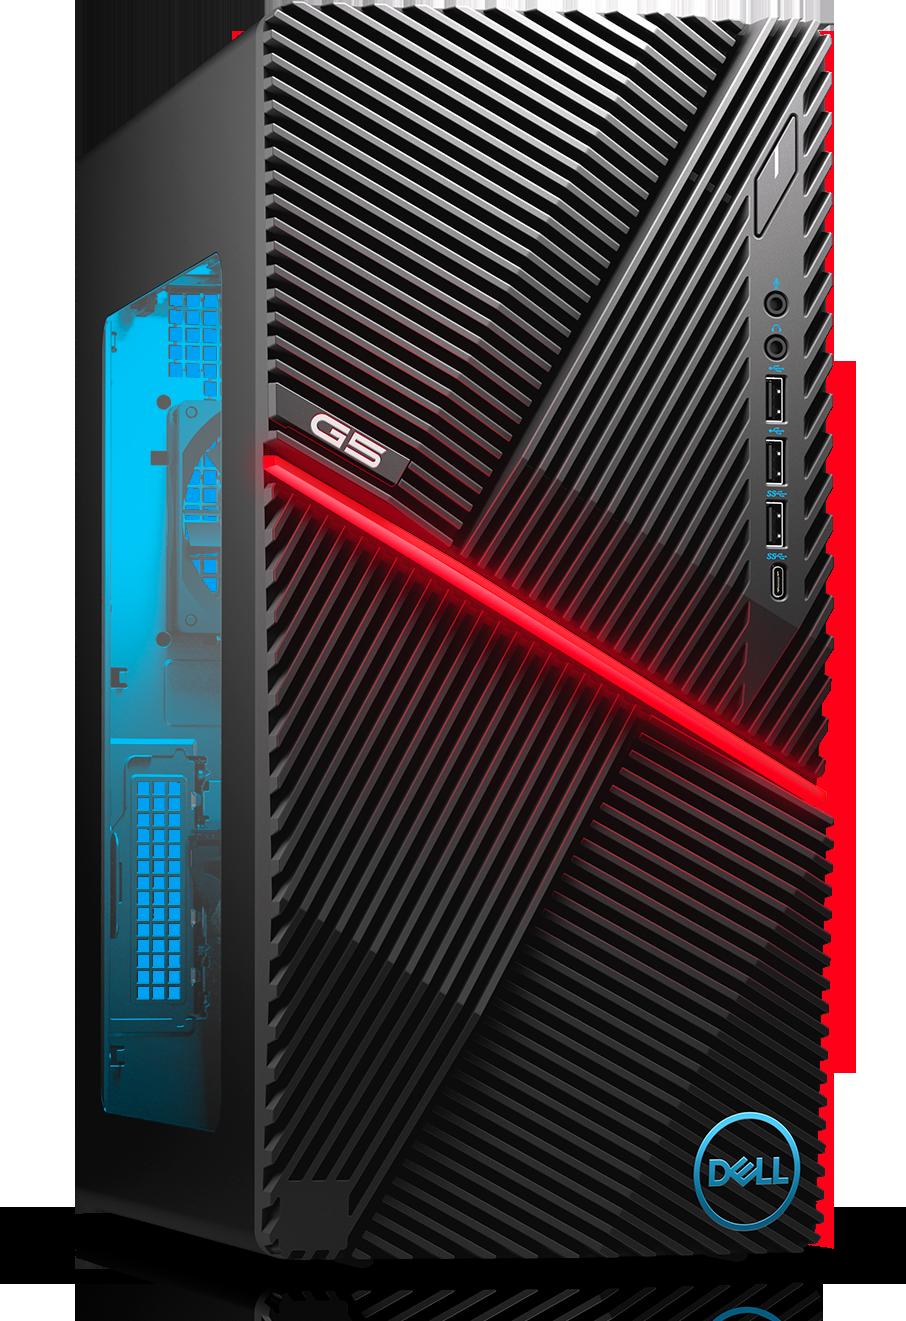 Dell G5 Desktop - Red